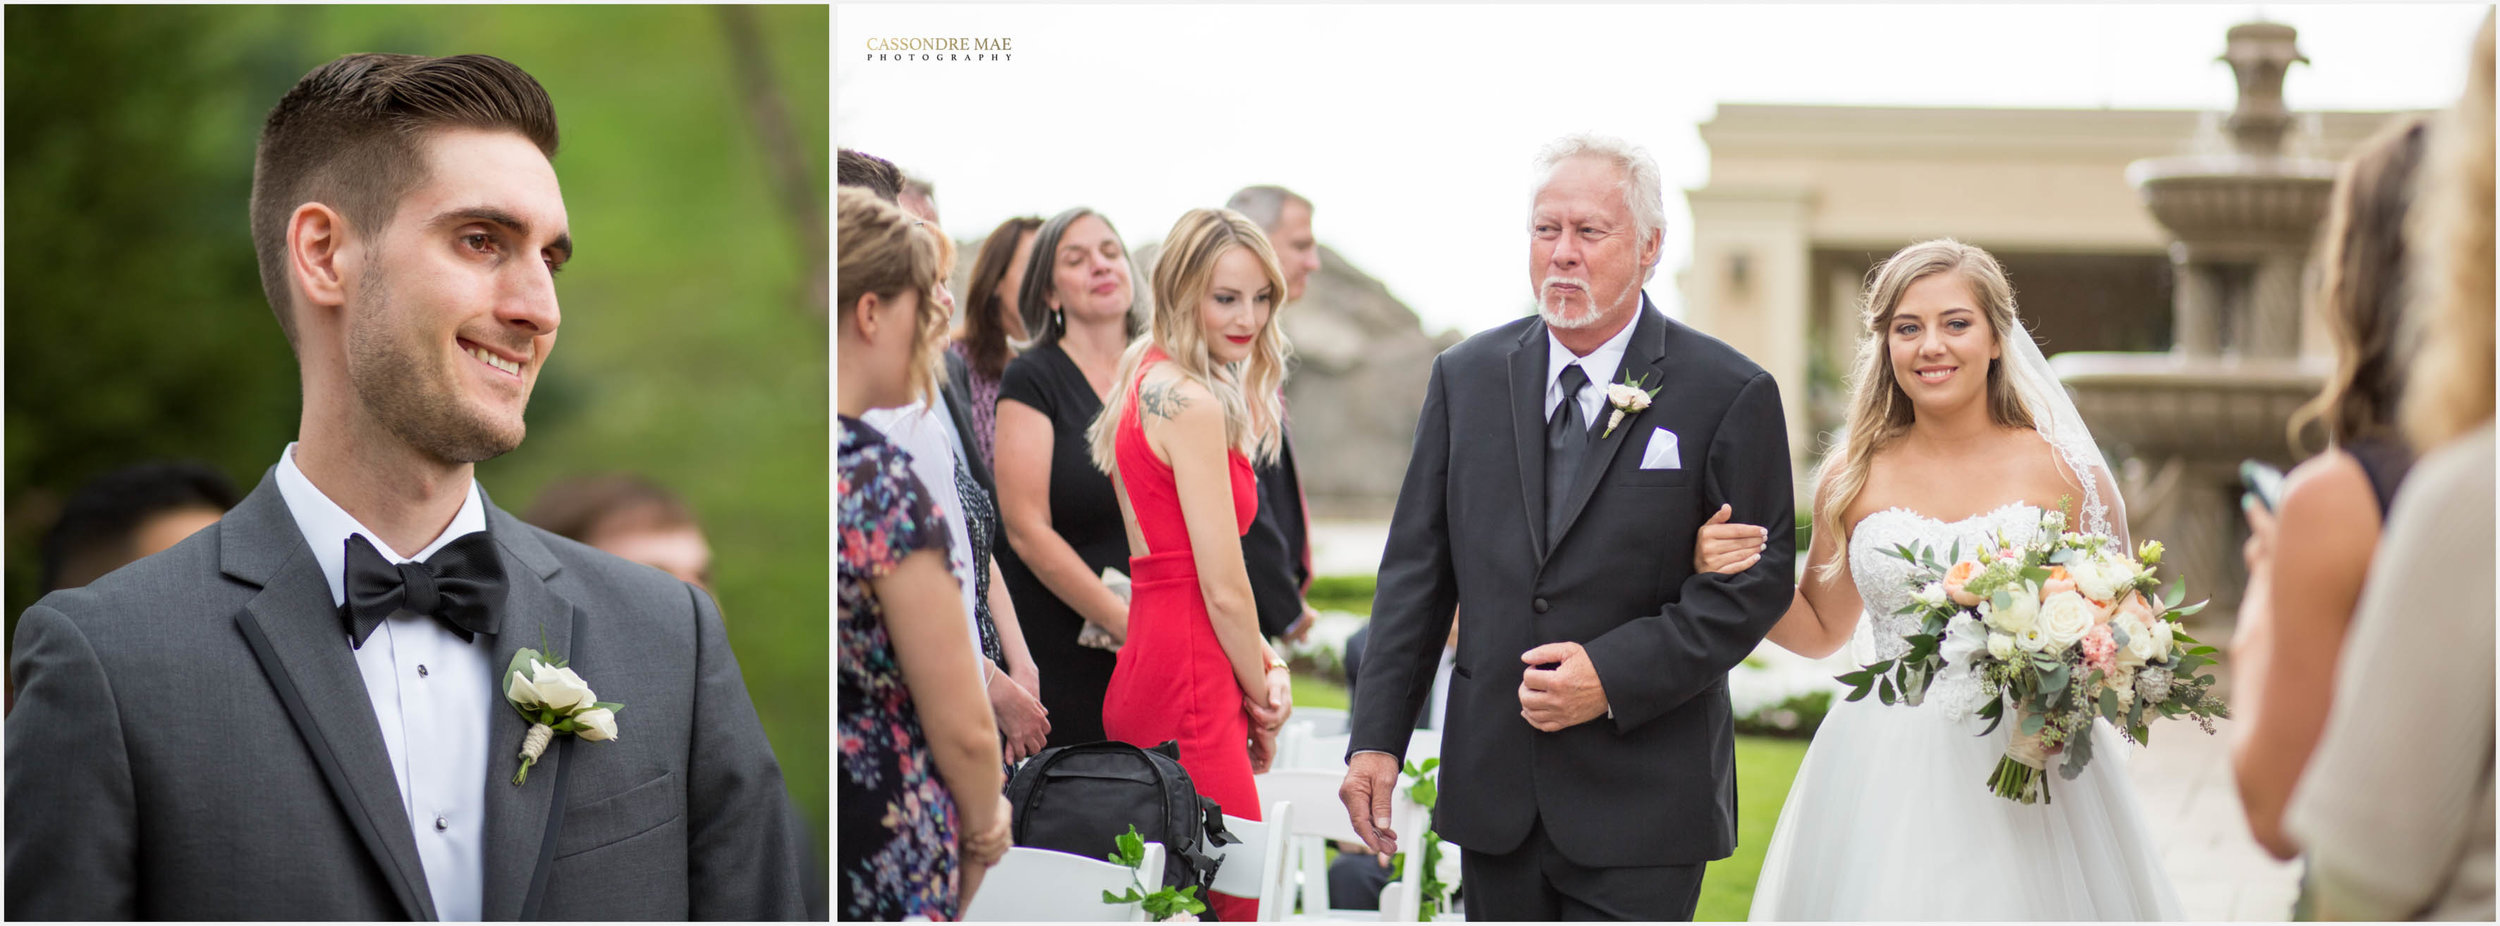 Cassondre Mae Photography Hudson Valley NY Wedding Photographer -22.jpg